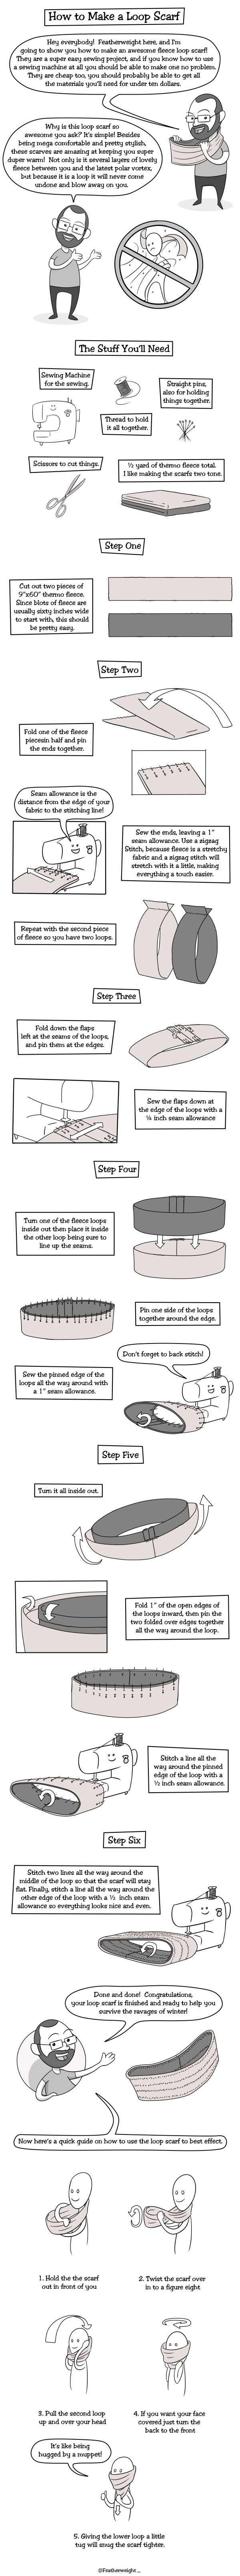 loop scarf tutorial by Featherweight